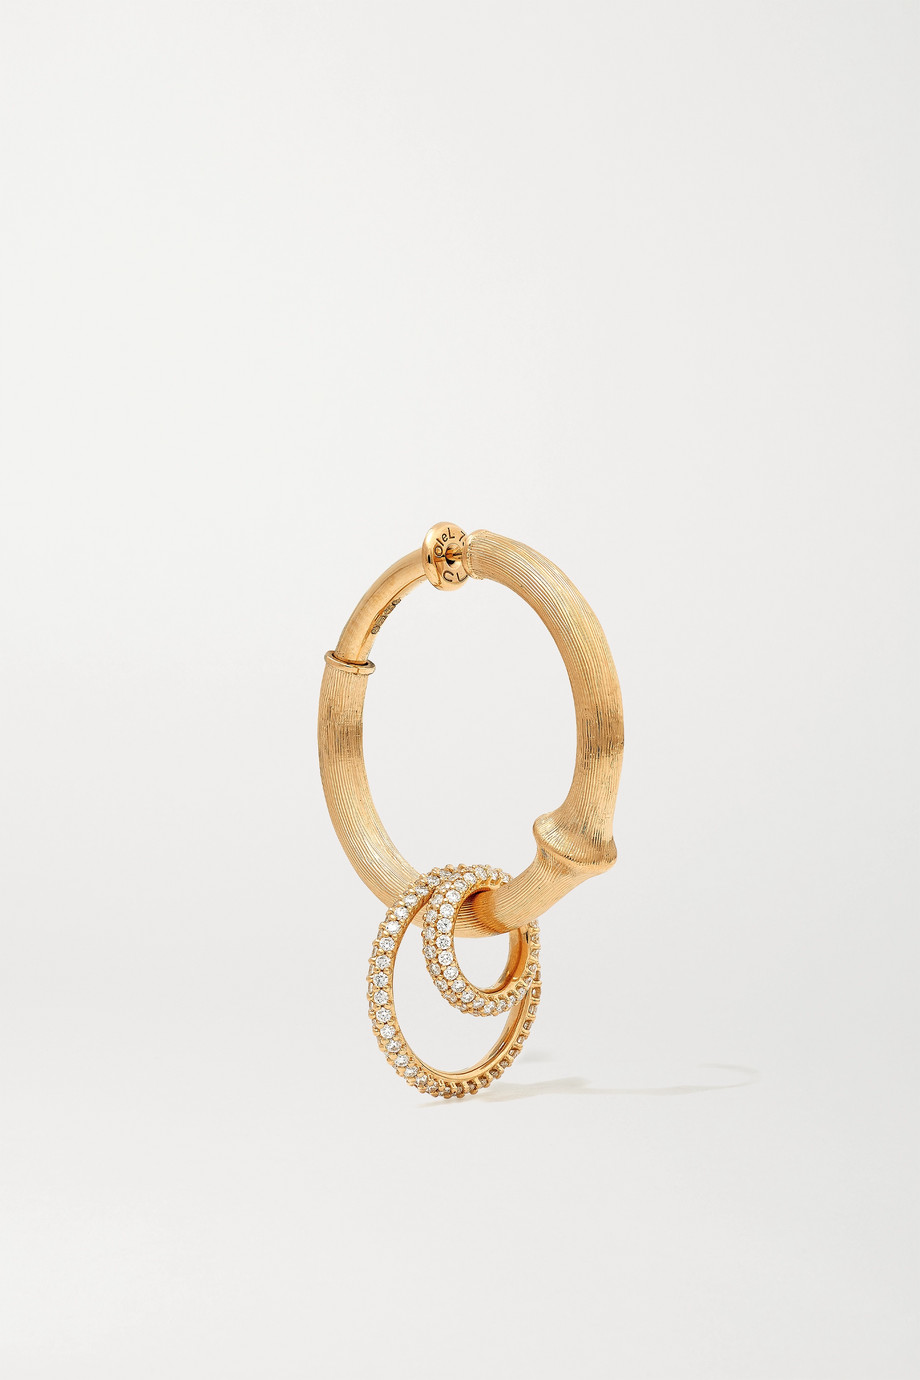 OLE LYNGGAARD COPENHAGEN Nature große Creole aus 18 Karat Gold mit Diamanten